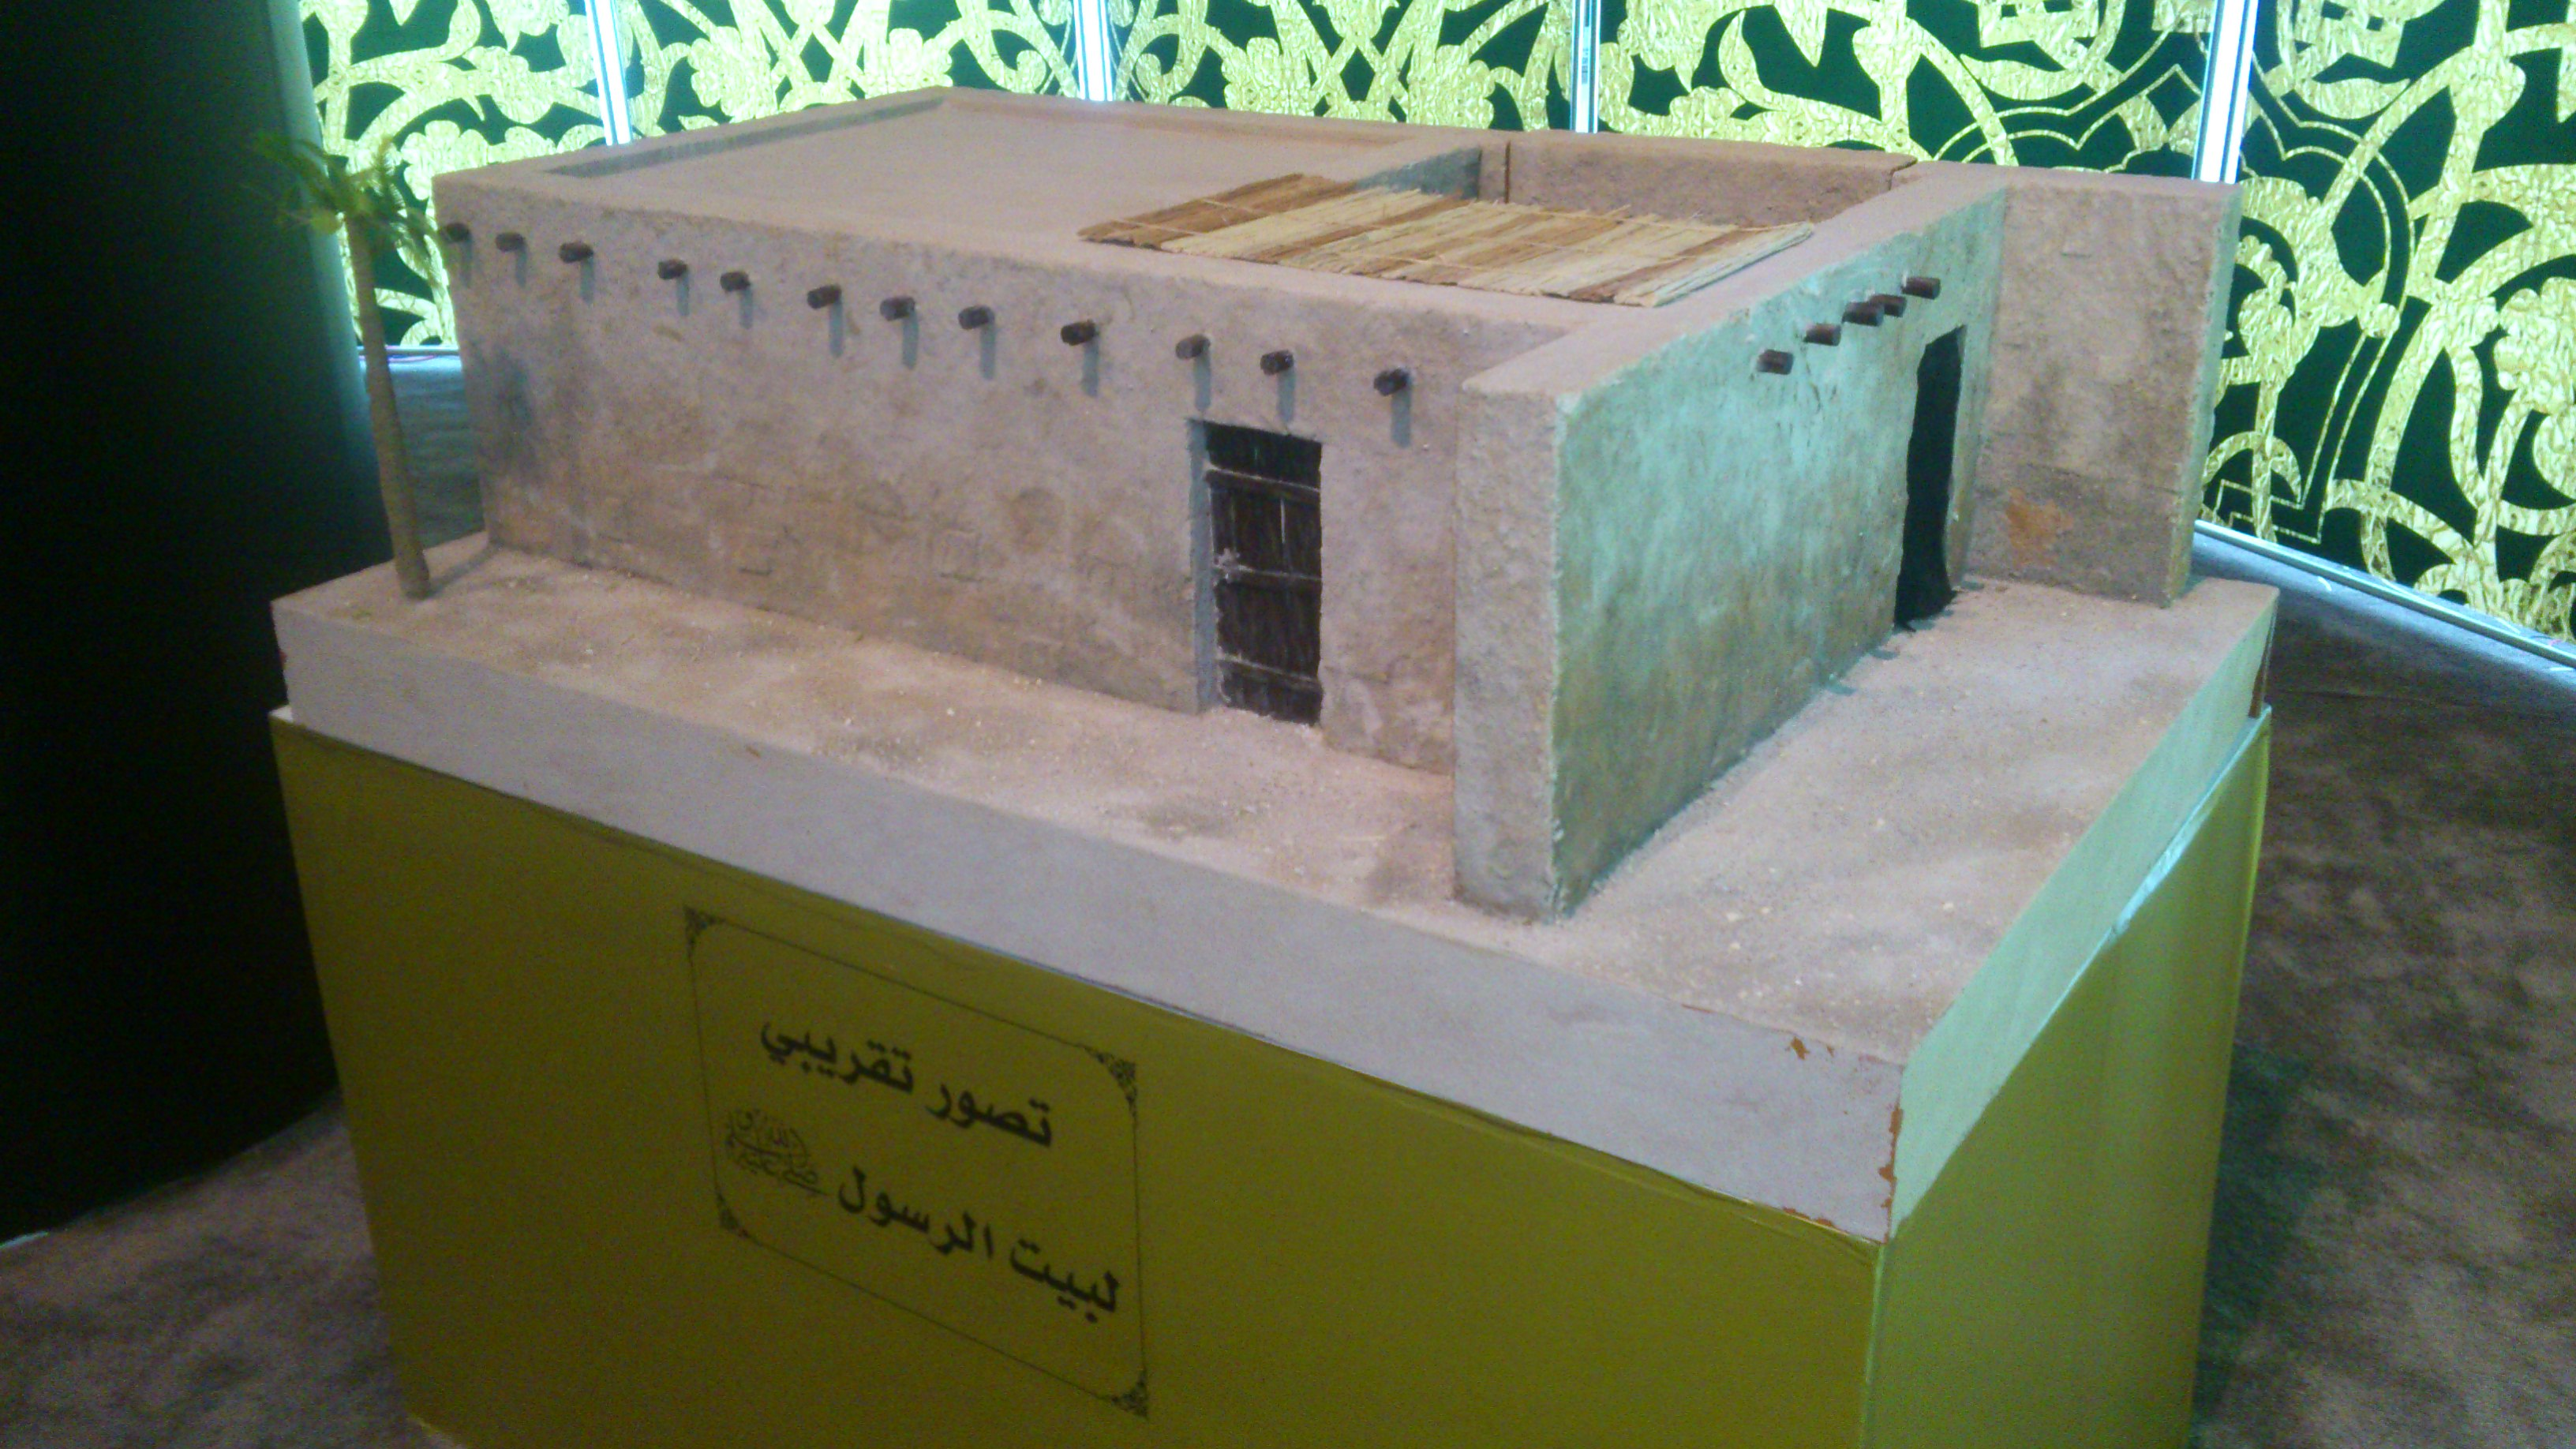 Pameran Rumah Rasulullah SAW Di Madinah Munawwarah